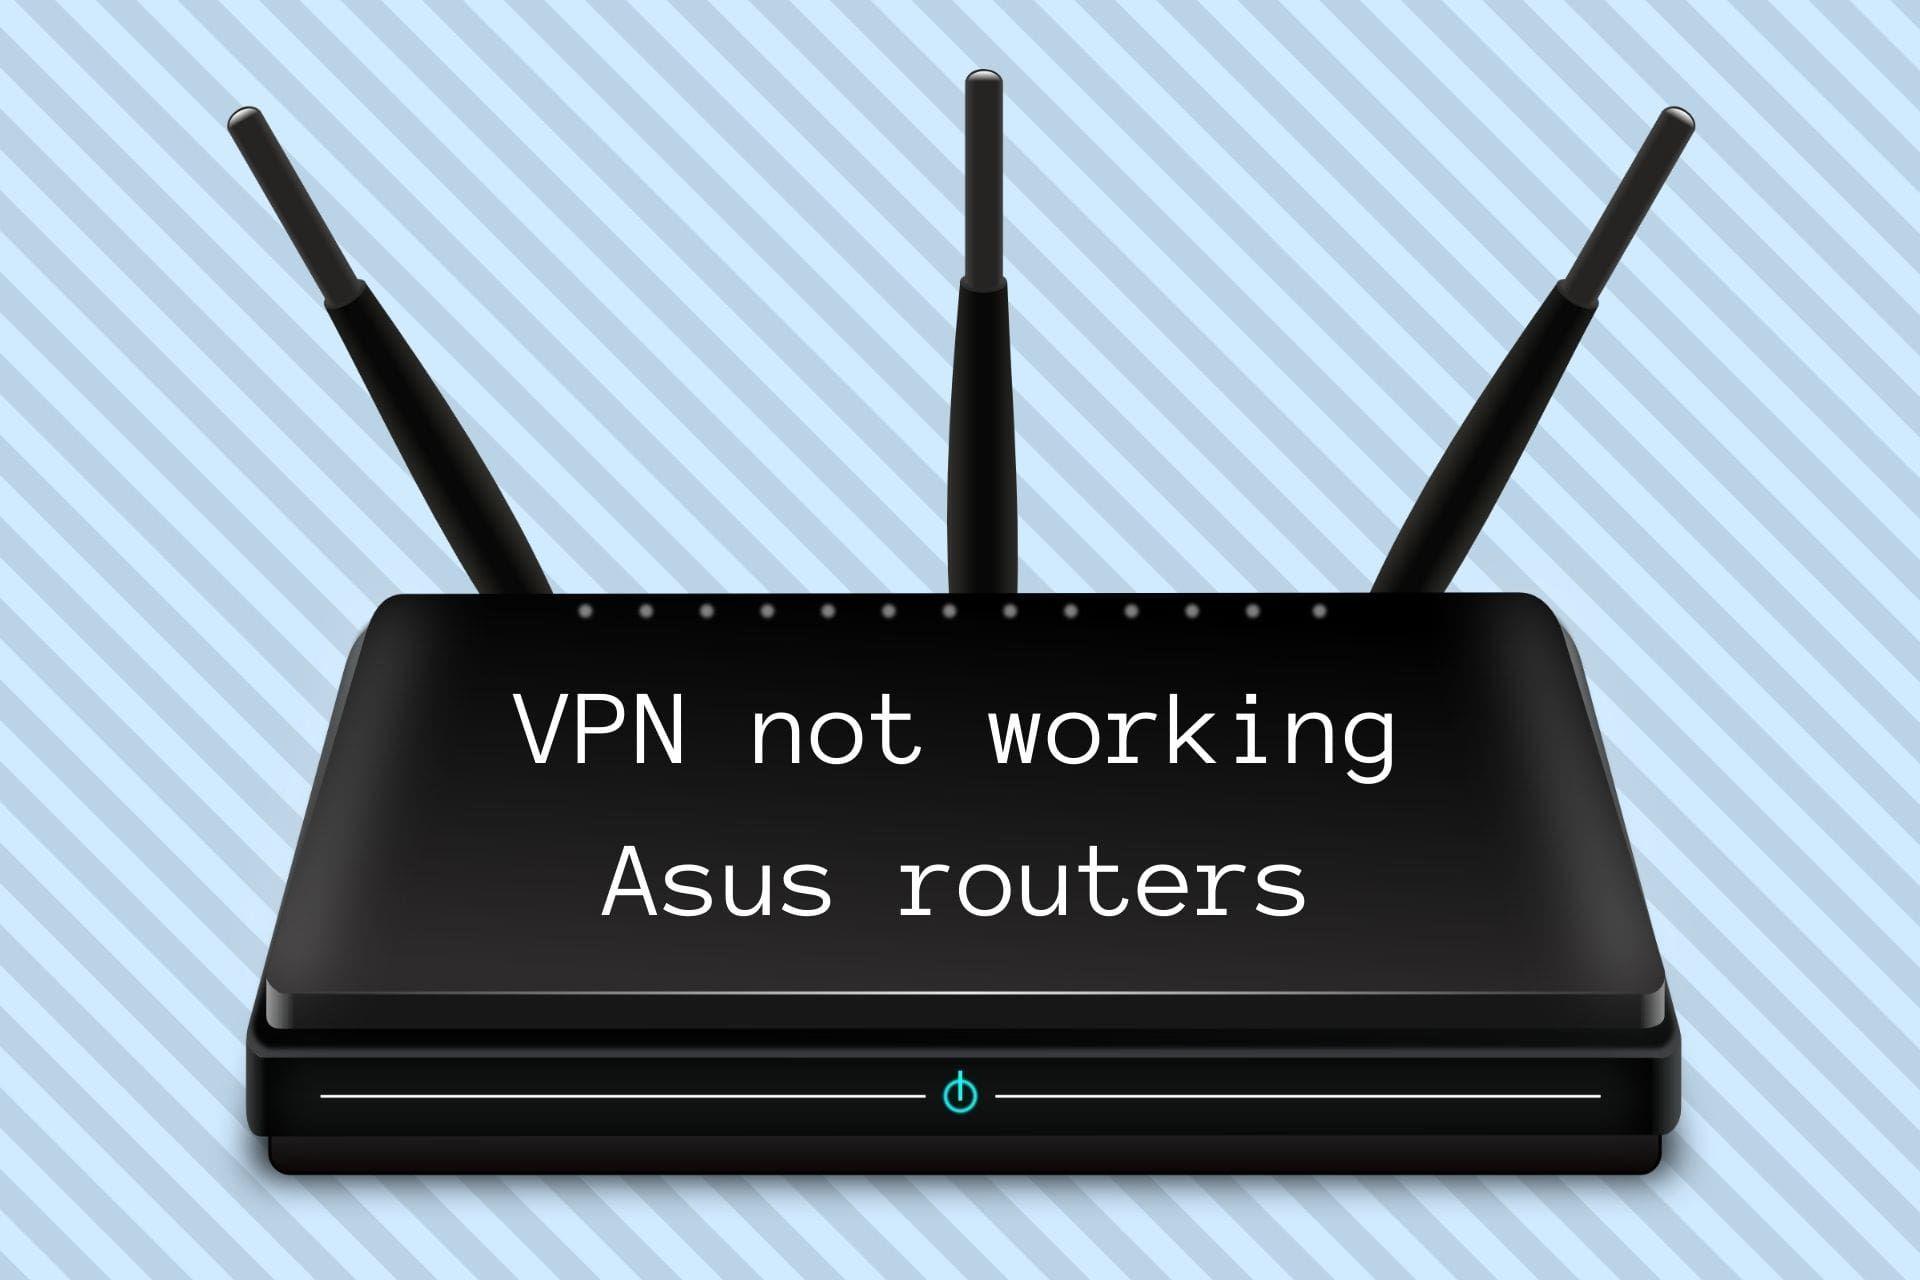 7e6eb6887e99c7ba0ccfedc2f6ef43bf - Do I Need A Vpn Router